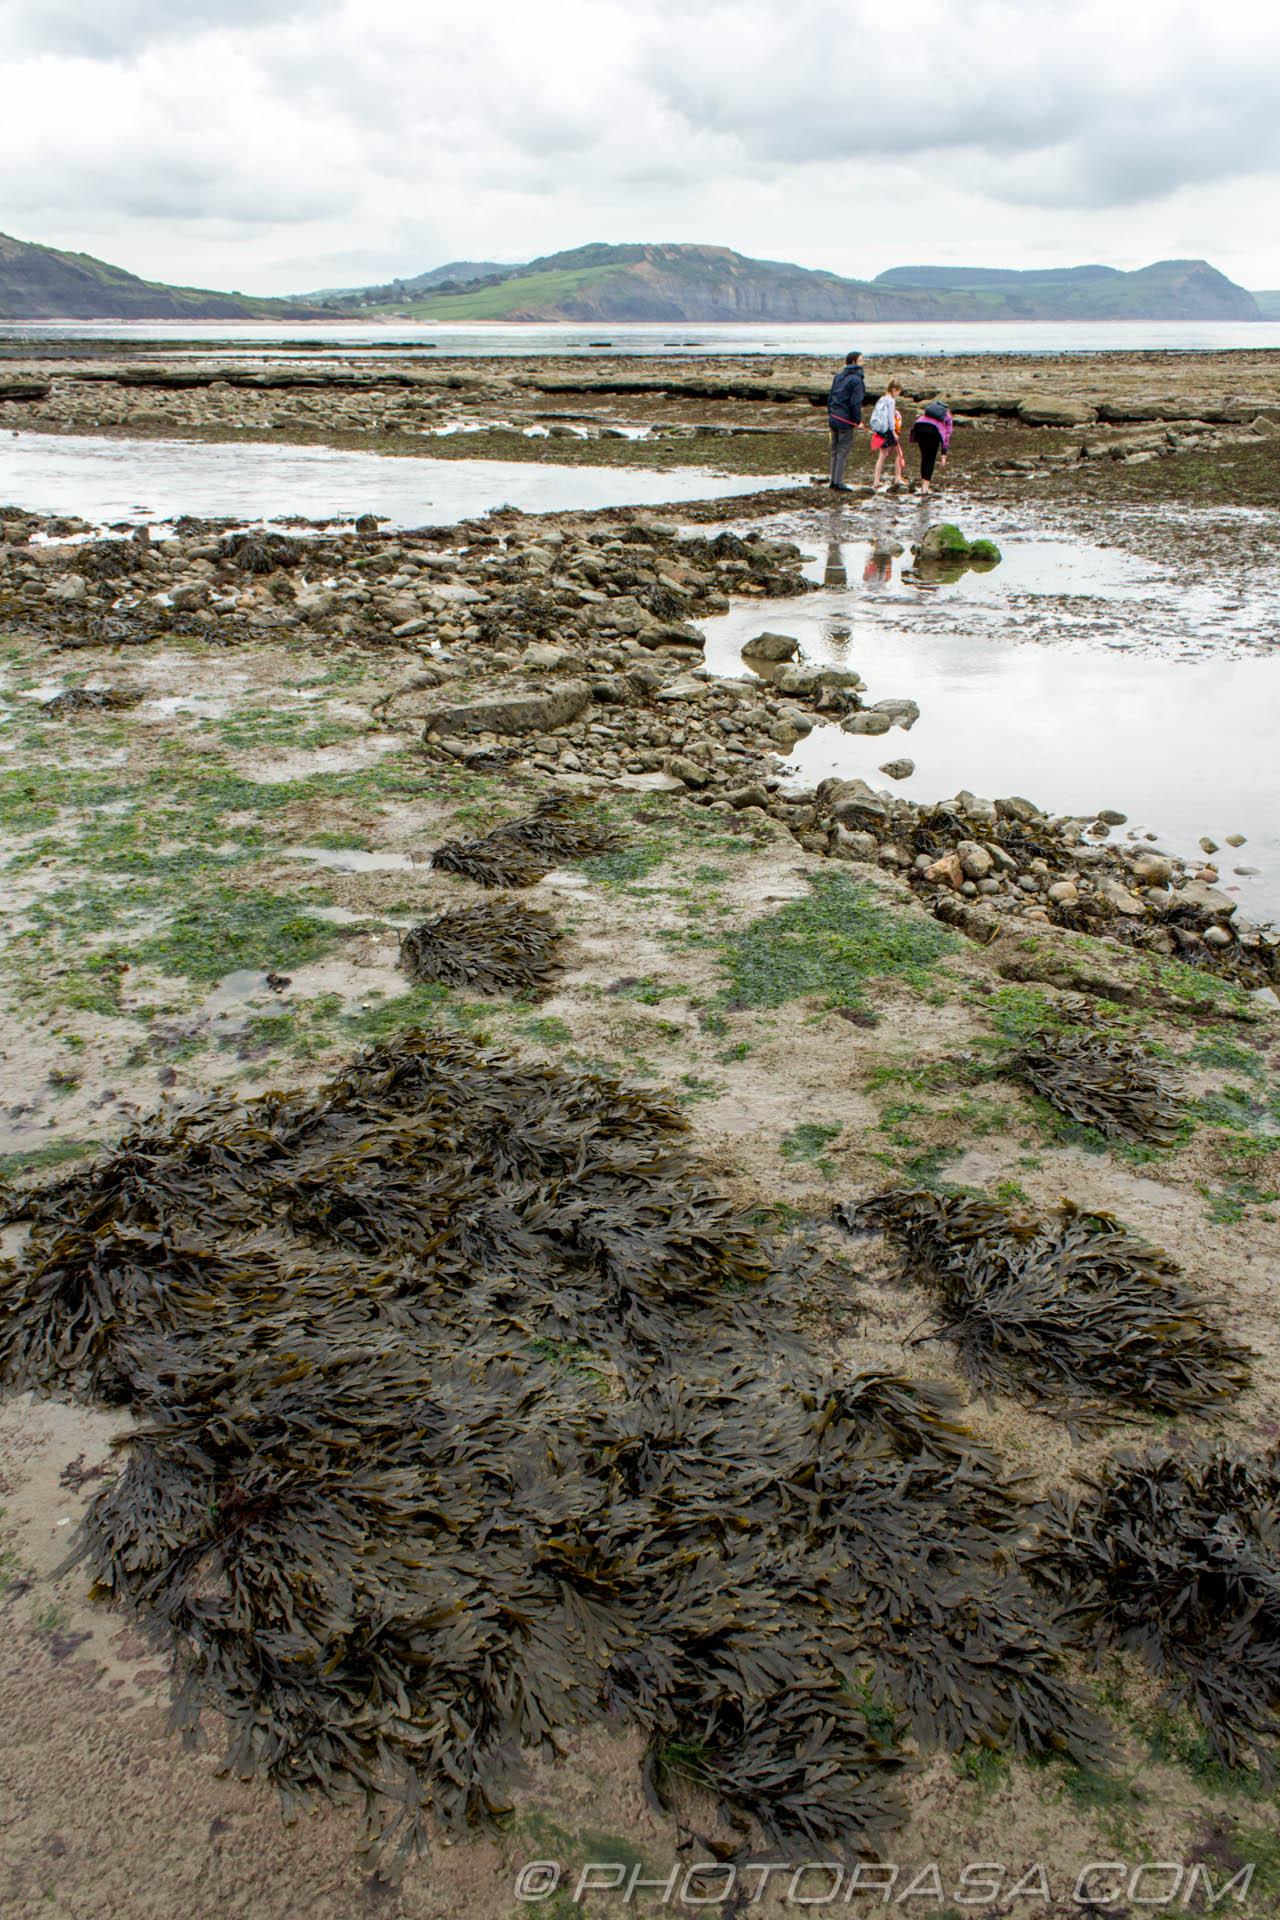 https://photorasa.com/jurassic-coast-lyme-regis/seaweed/